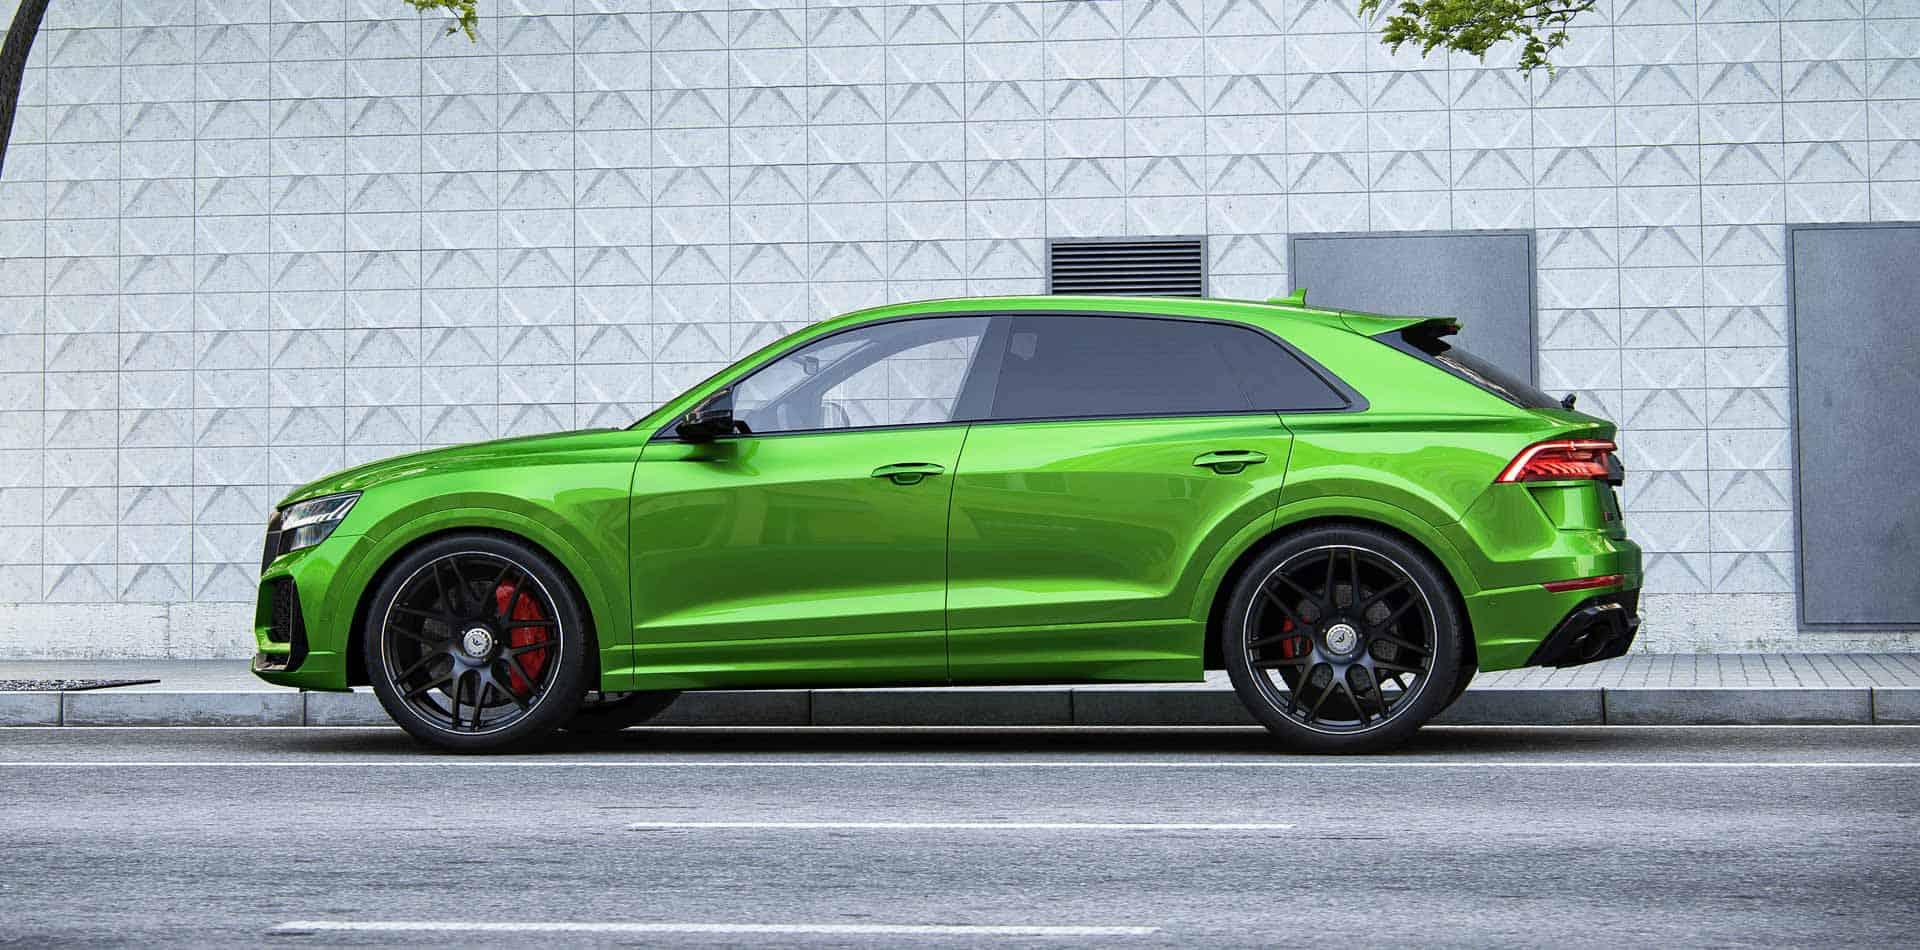 Audi-RS-Q8-by-Wheelsandmore-3